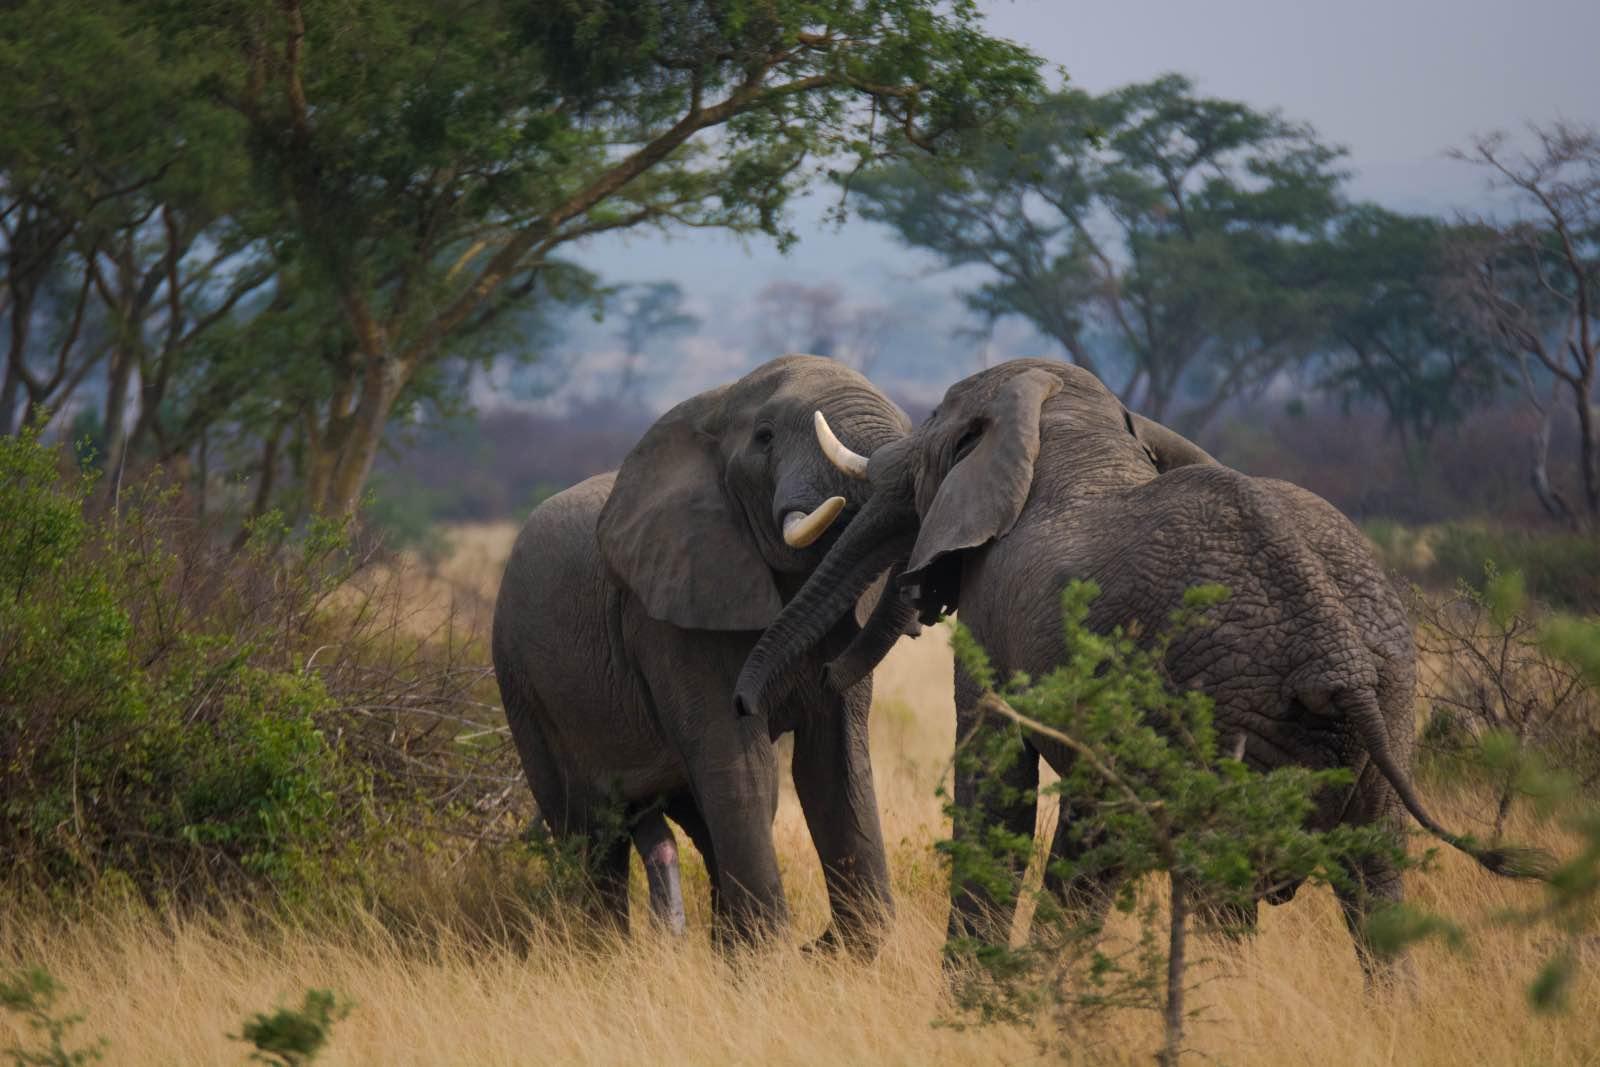 A pair of elephant bulls having a tussle